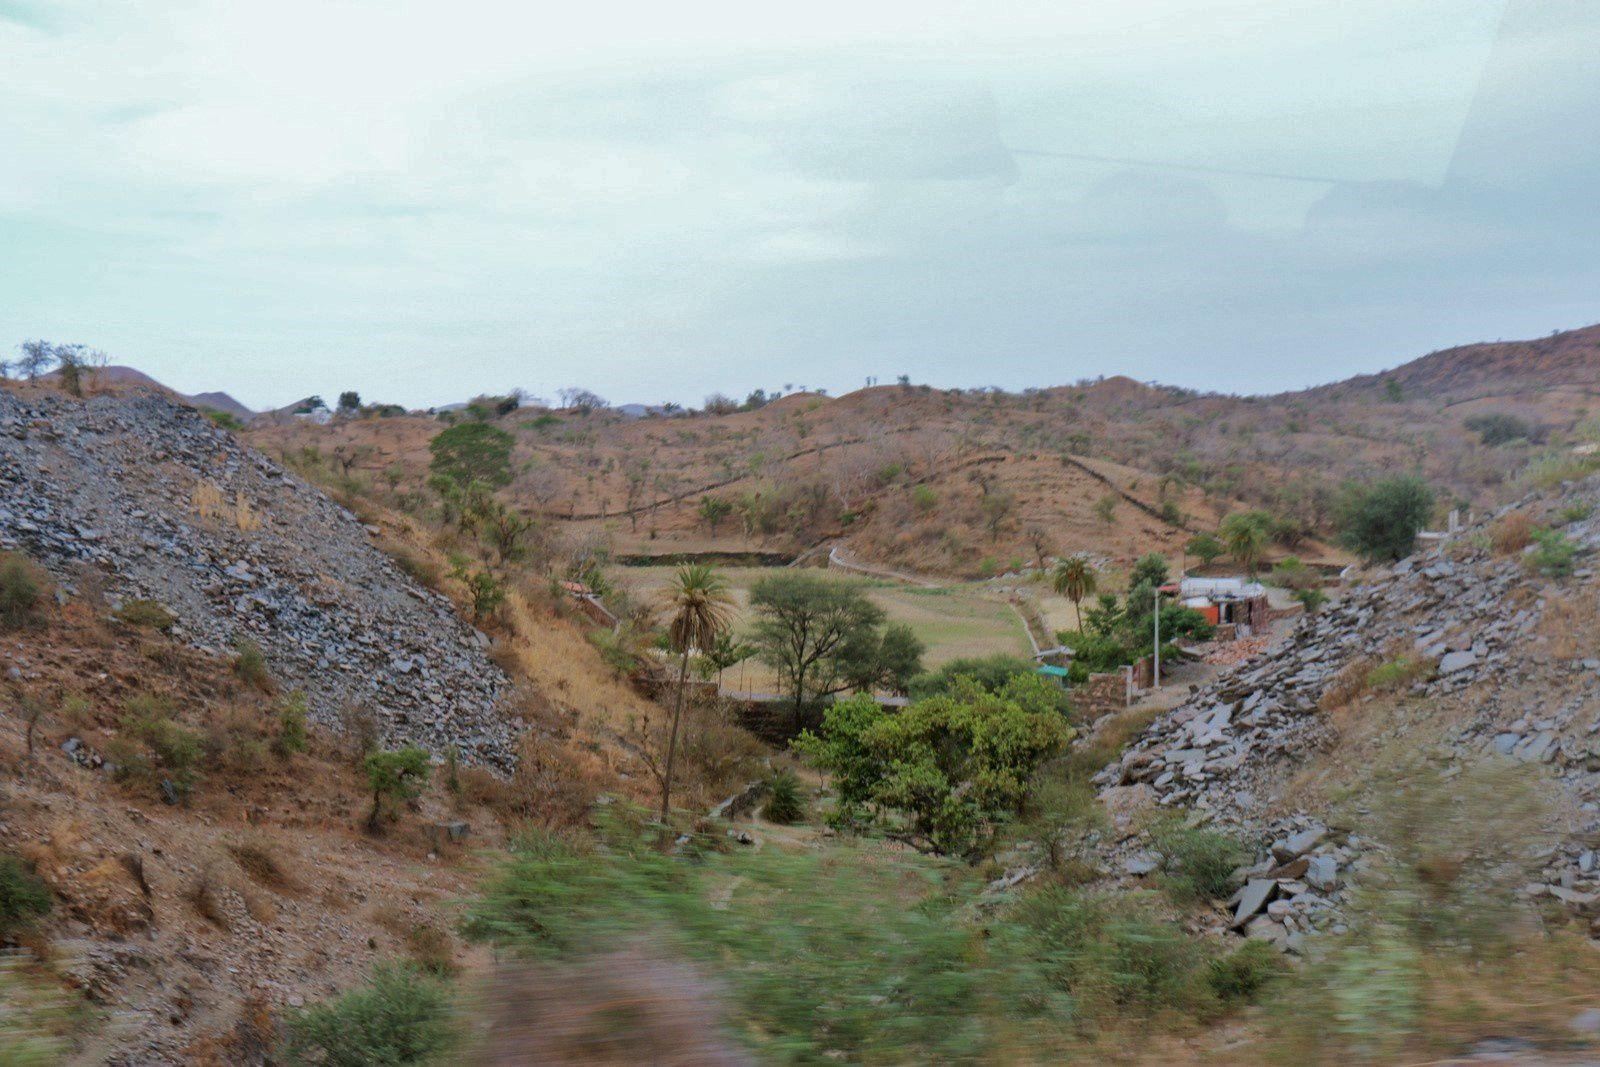 Araghatta (roue hydraulique), Rajasthan (Inde)